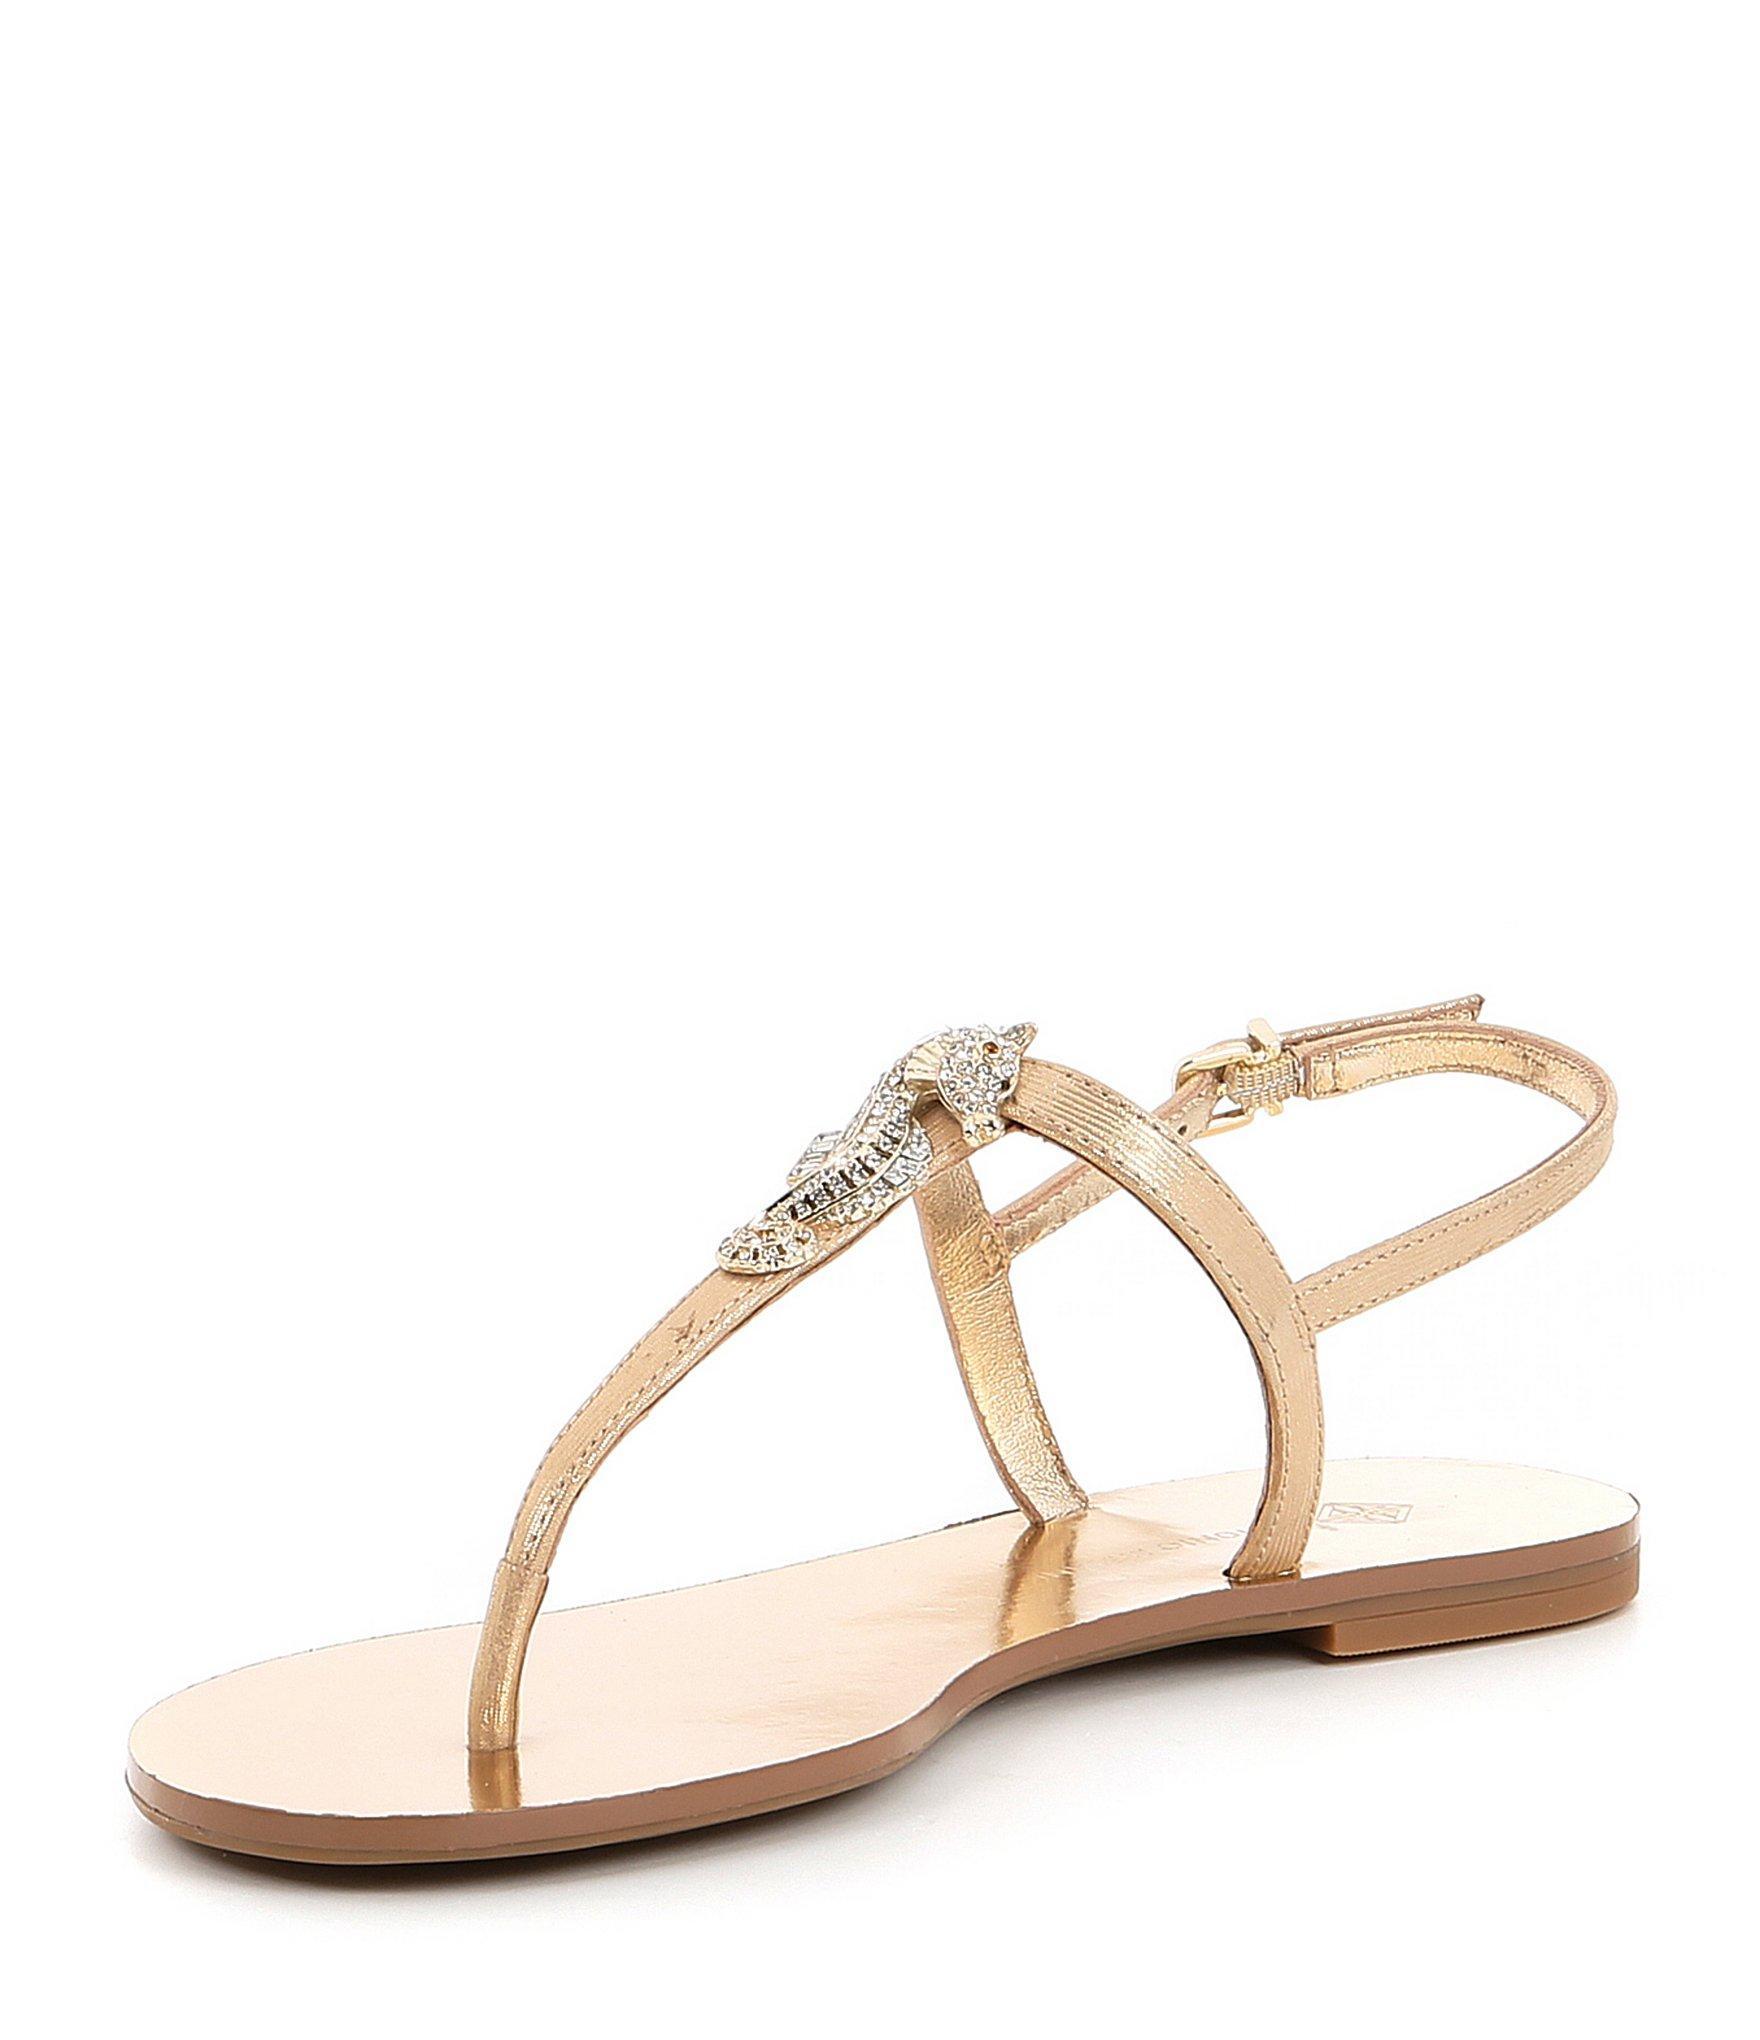 058a74a7143d9d Lyst - Antonio Melani Saija Jewel Seahorse Ornament Metallic Thong ...